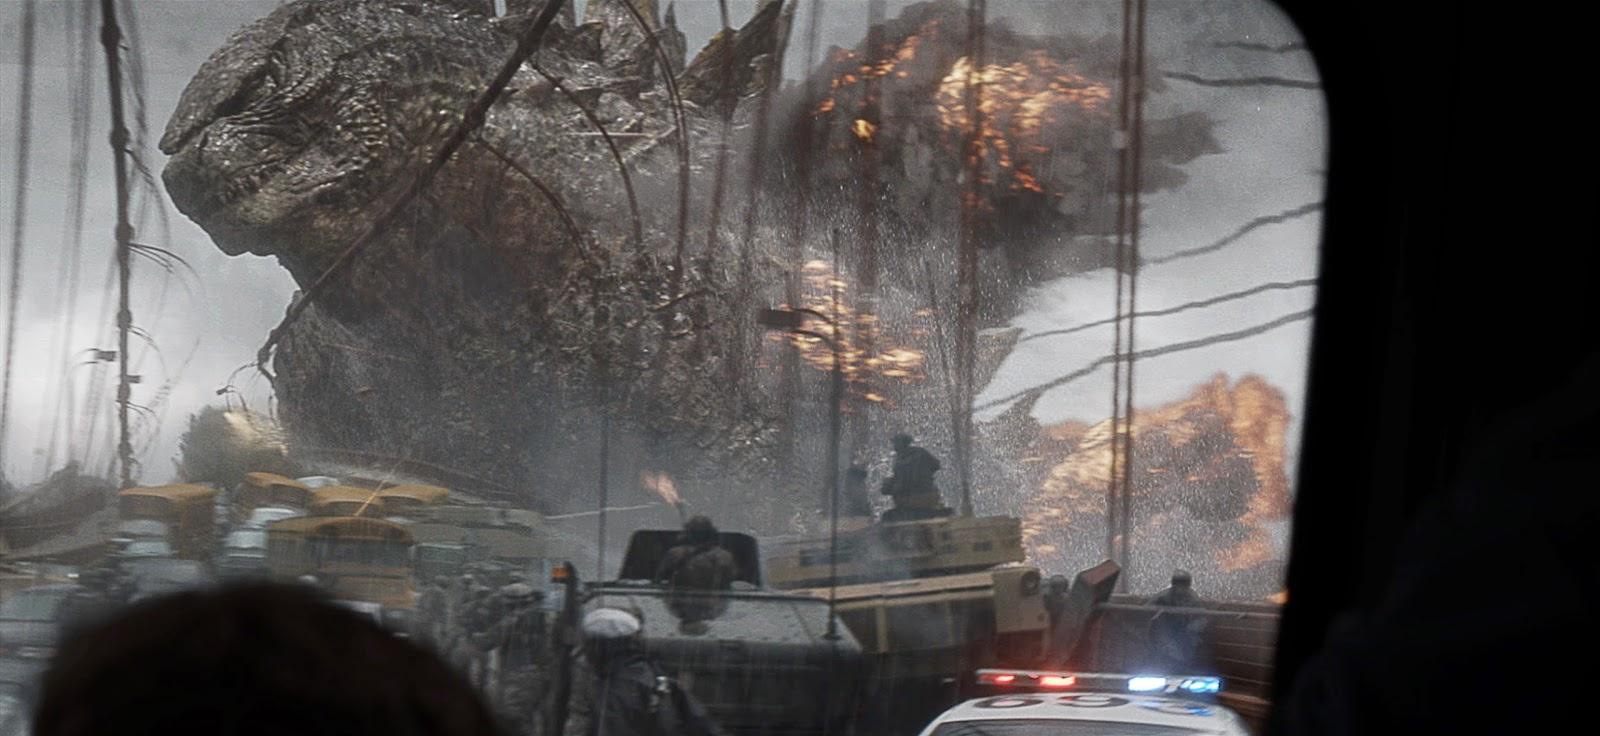 O Rei dos Monstros se prepara para a briga nos primeiros clipes de Godzilla, com Bryan Cranston e Ken Watanabe